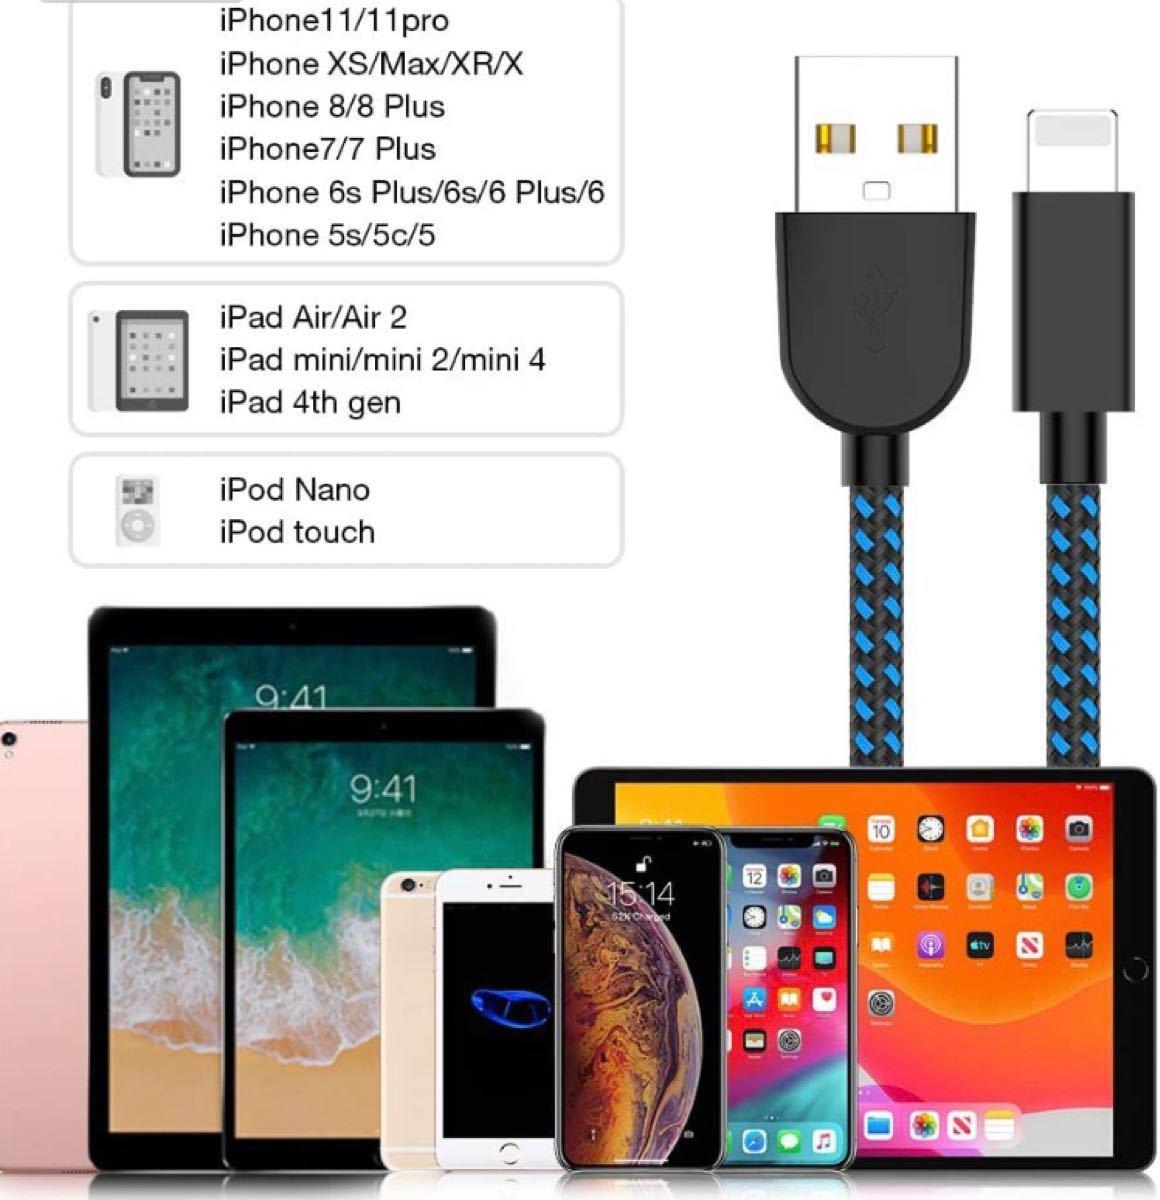 iPhone充電ケーブル5本セットLightningケーブルライトニングケーブル iPhone データ転送 急速充電